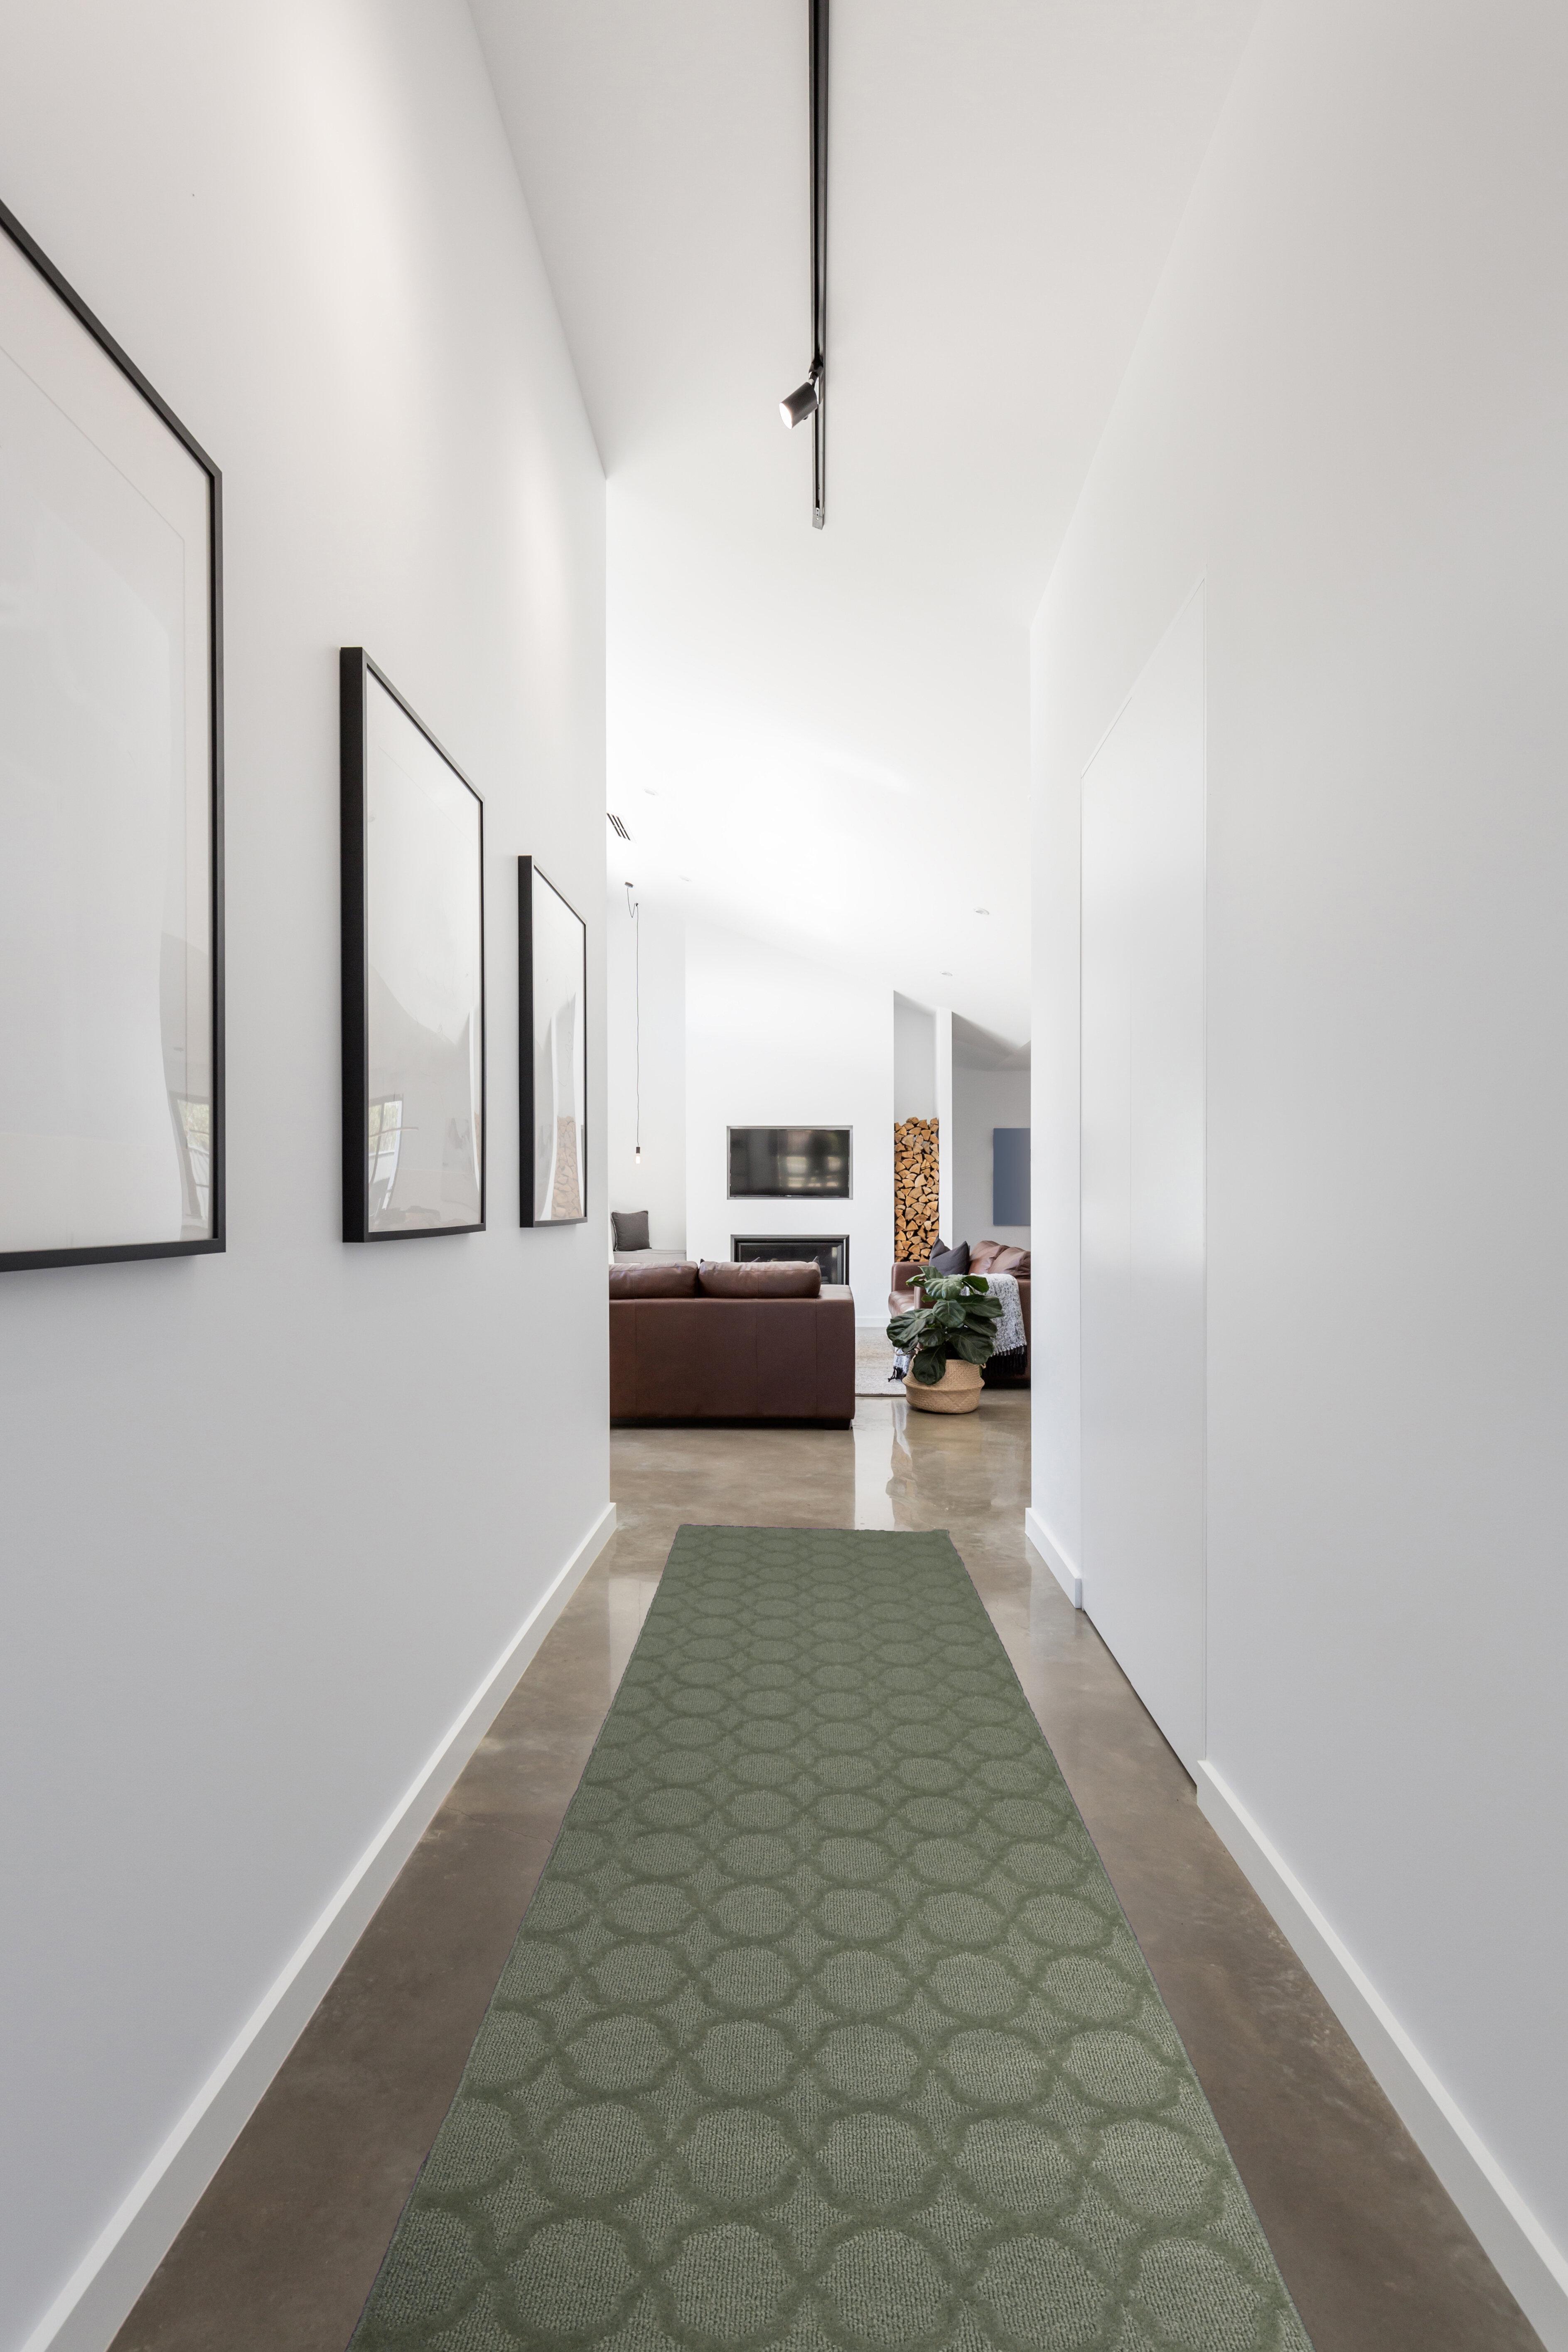 Charlton Home Southington Geometric Tufted Green Area Rug Wayfair